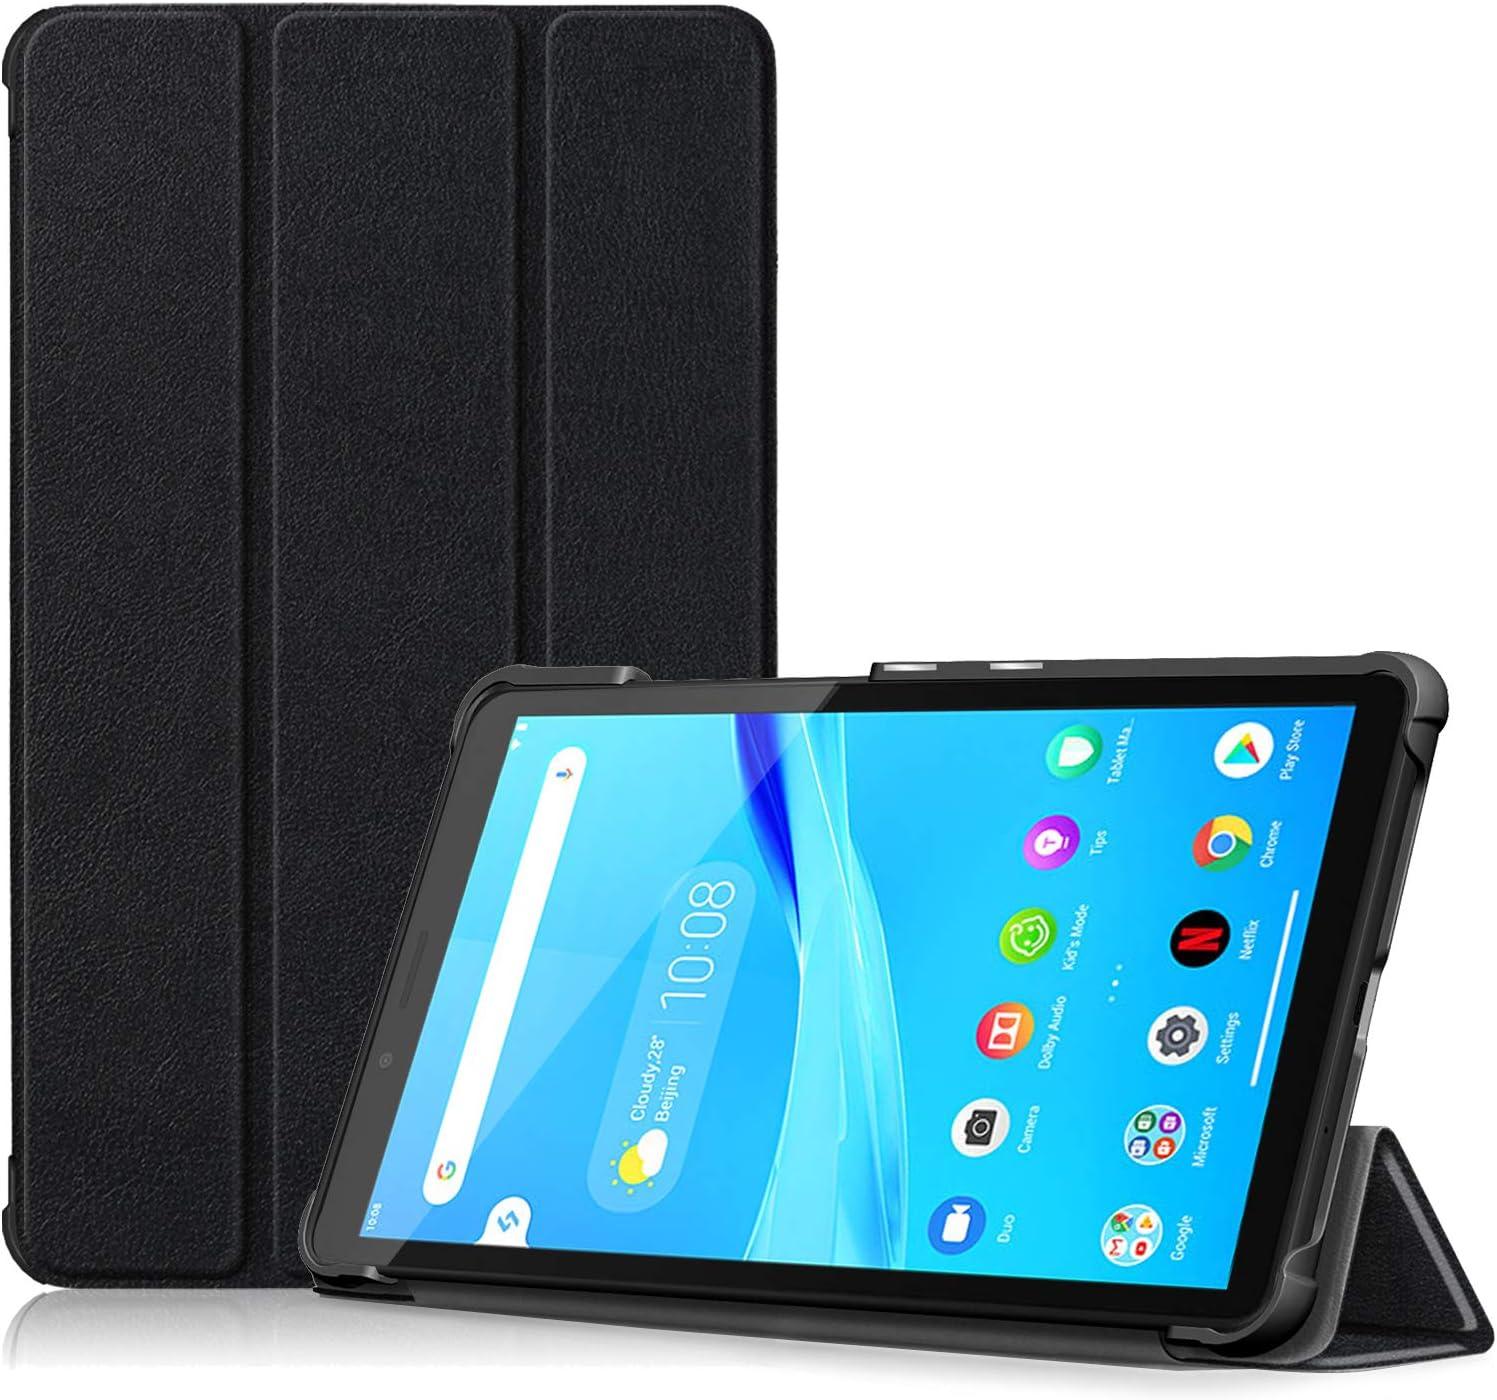 "ProCase Lenovo Tab M7 Case TB-7305F 2019, Slim Lightweight Stand Hard Shell Case Protective Cover for 7"" 2019 Lenovo Tab M7 (2nd Gen) Tablet TB-7305F TB-7305L TB-7305X -Black"